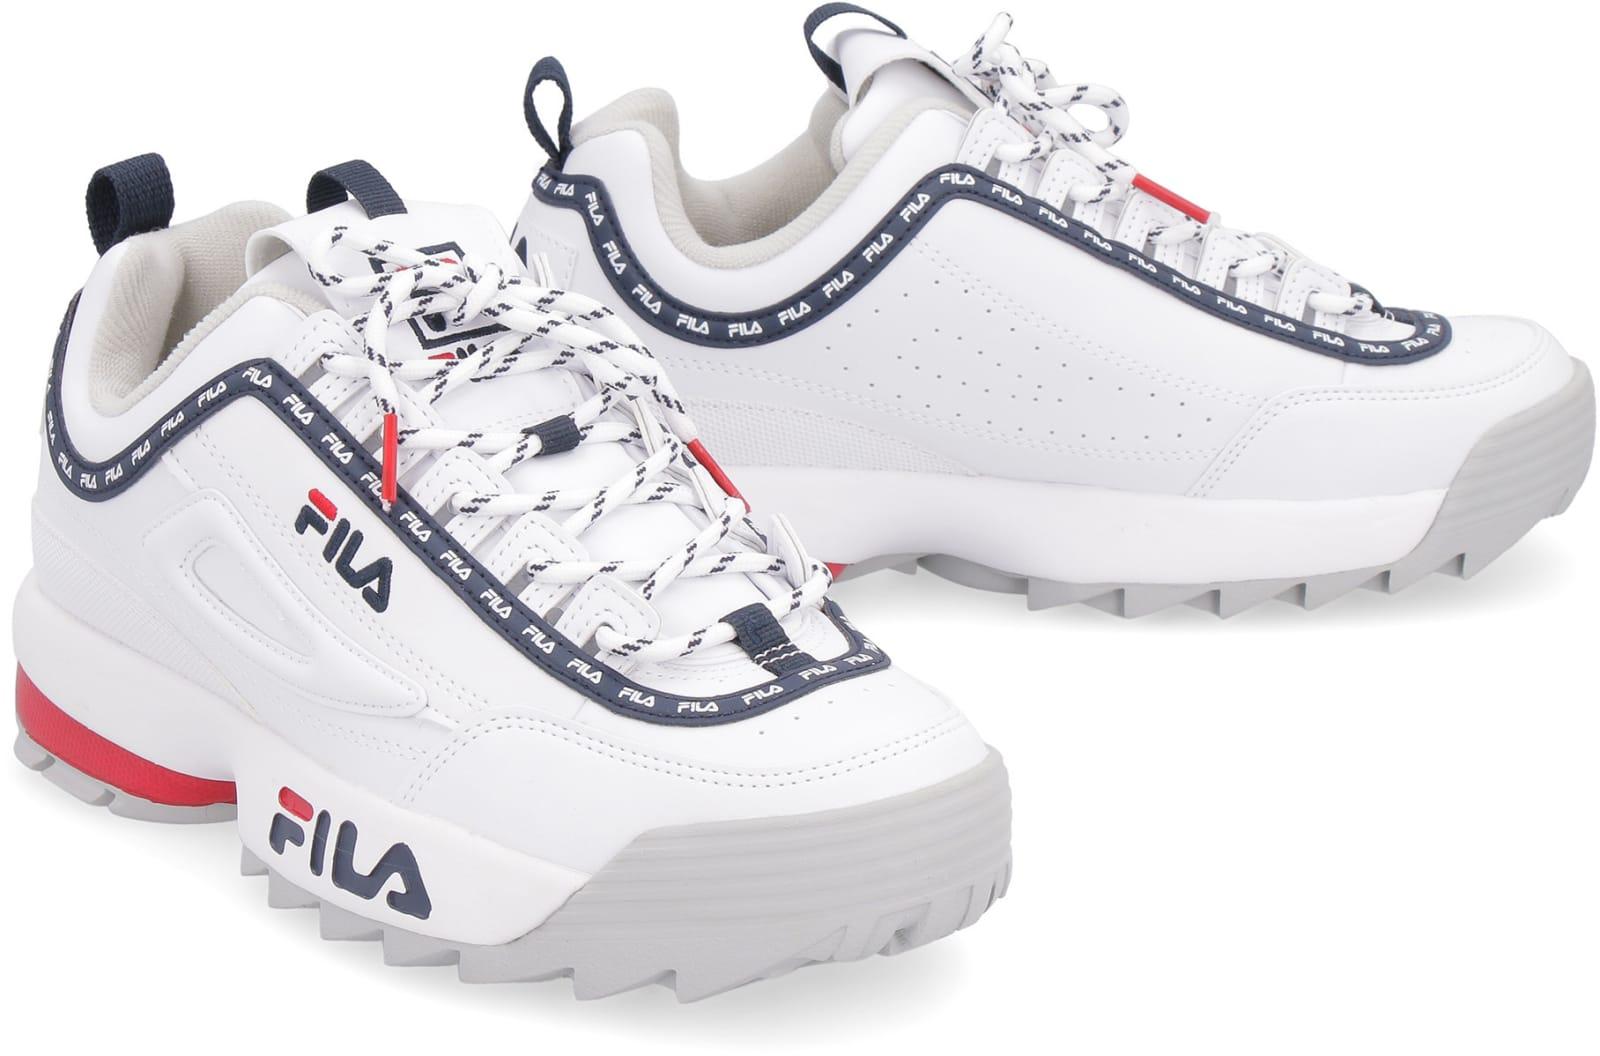 Fila Fila Distruptor Low top Sneakers White 11154195